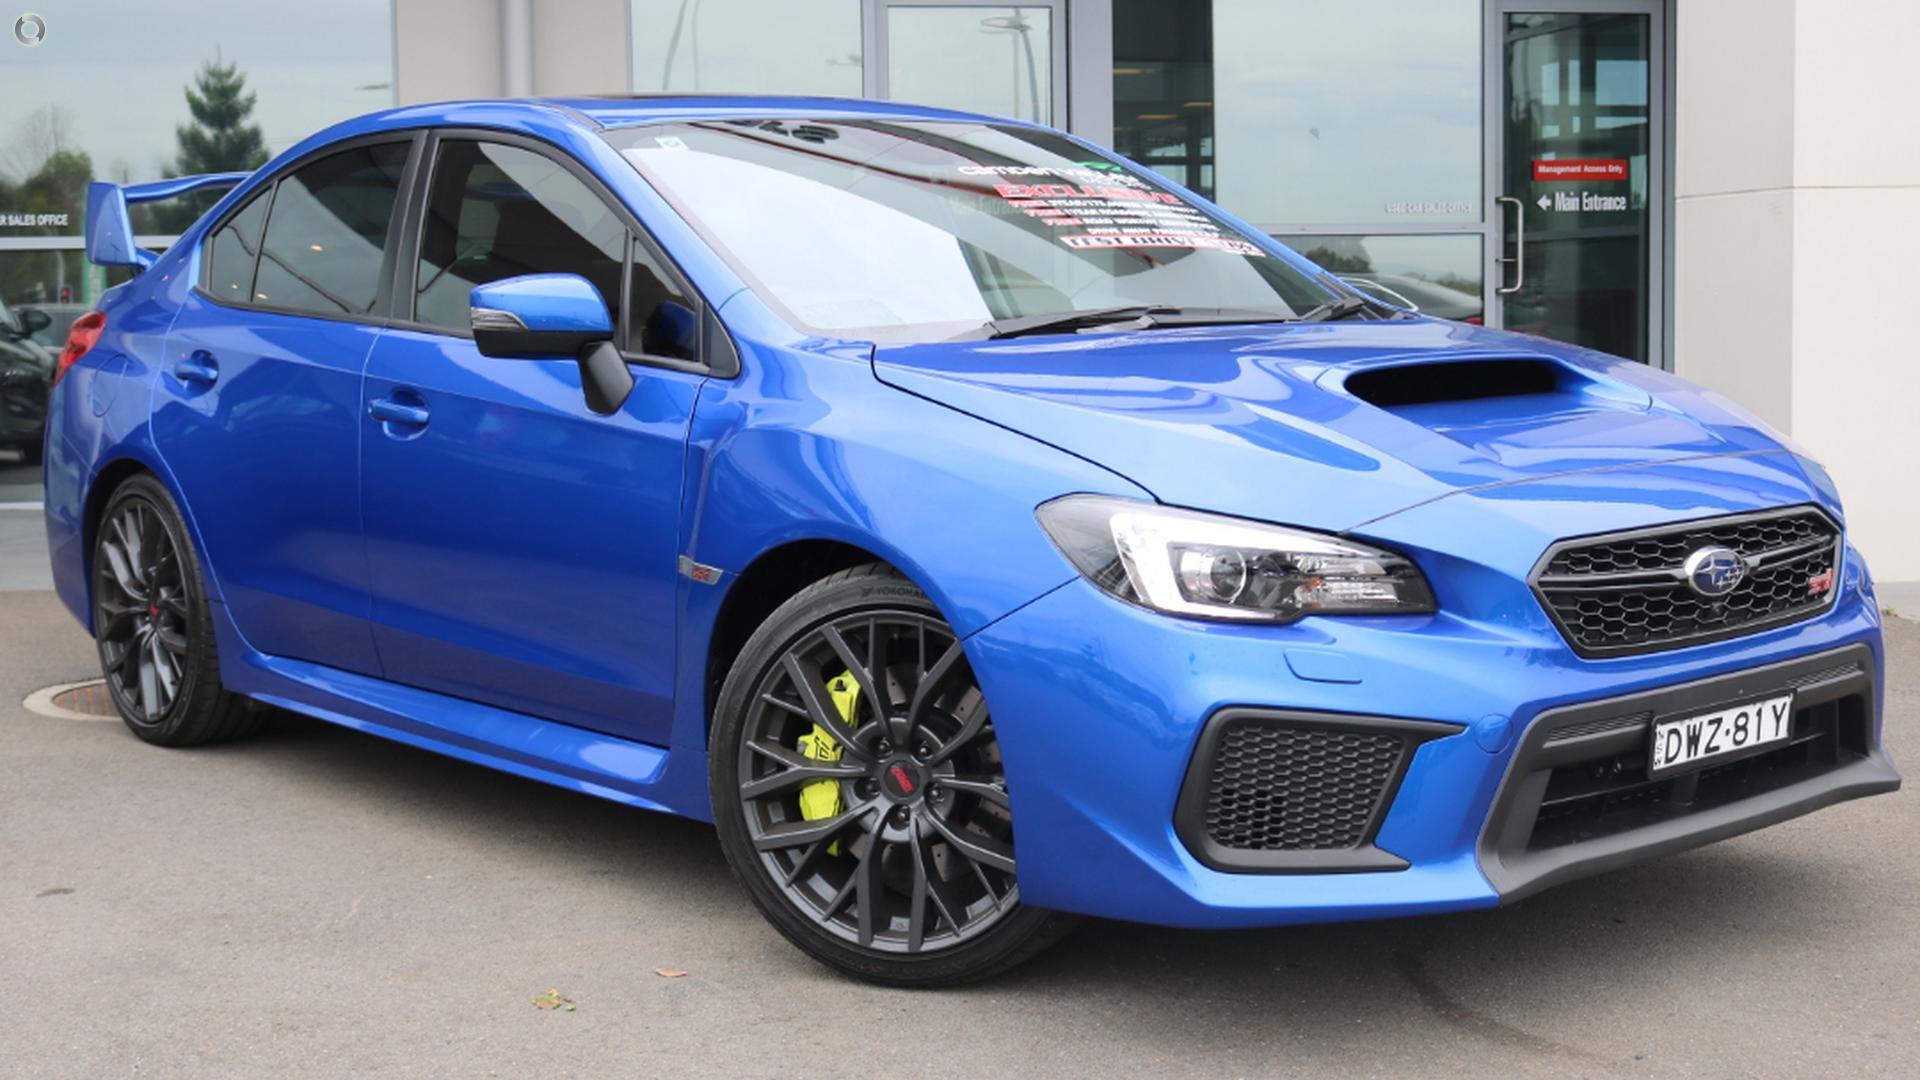 2017 Subaru Wrx Sti Spec.r